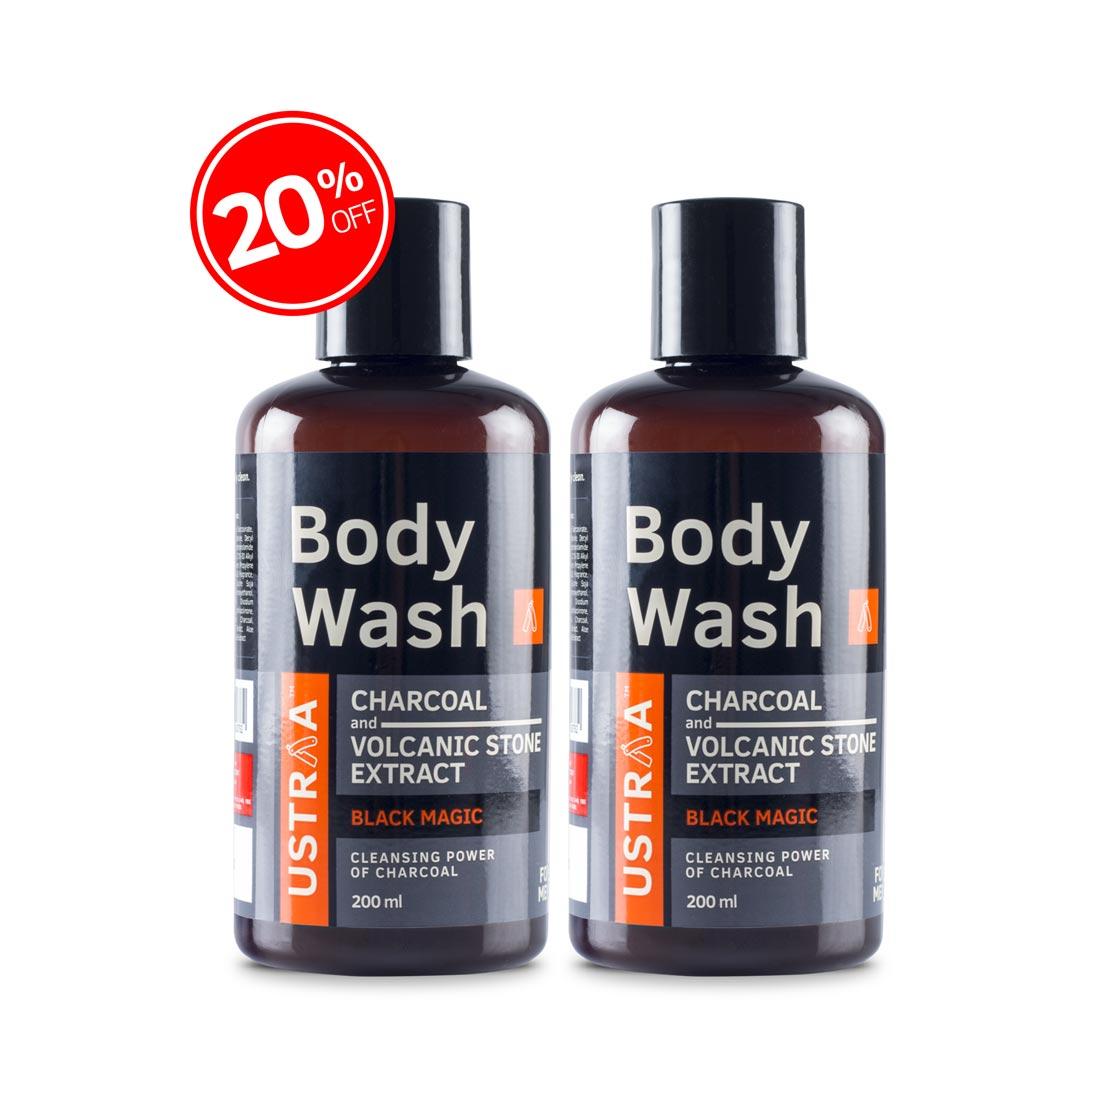 Body Wash - Black Magic - Set of 2